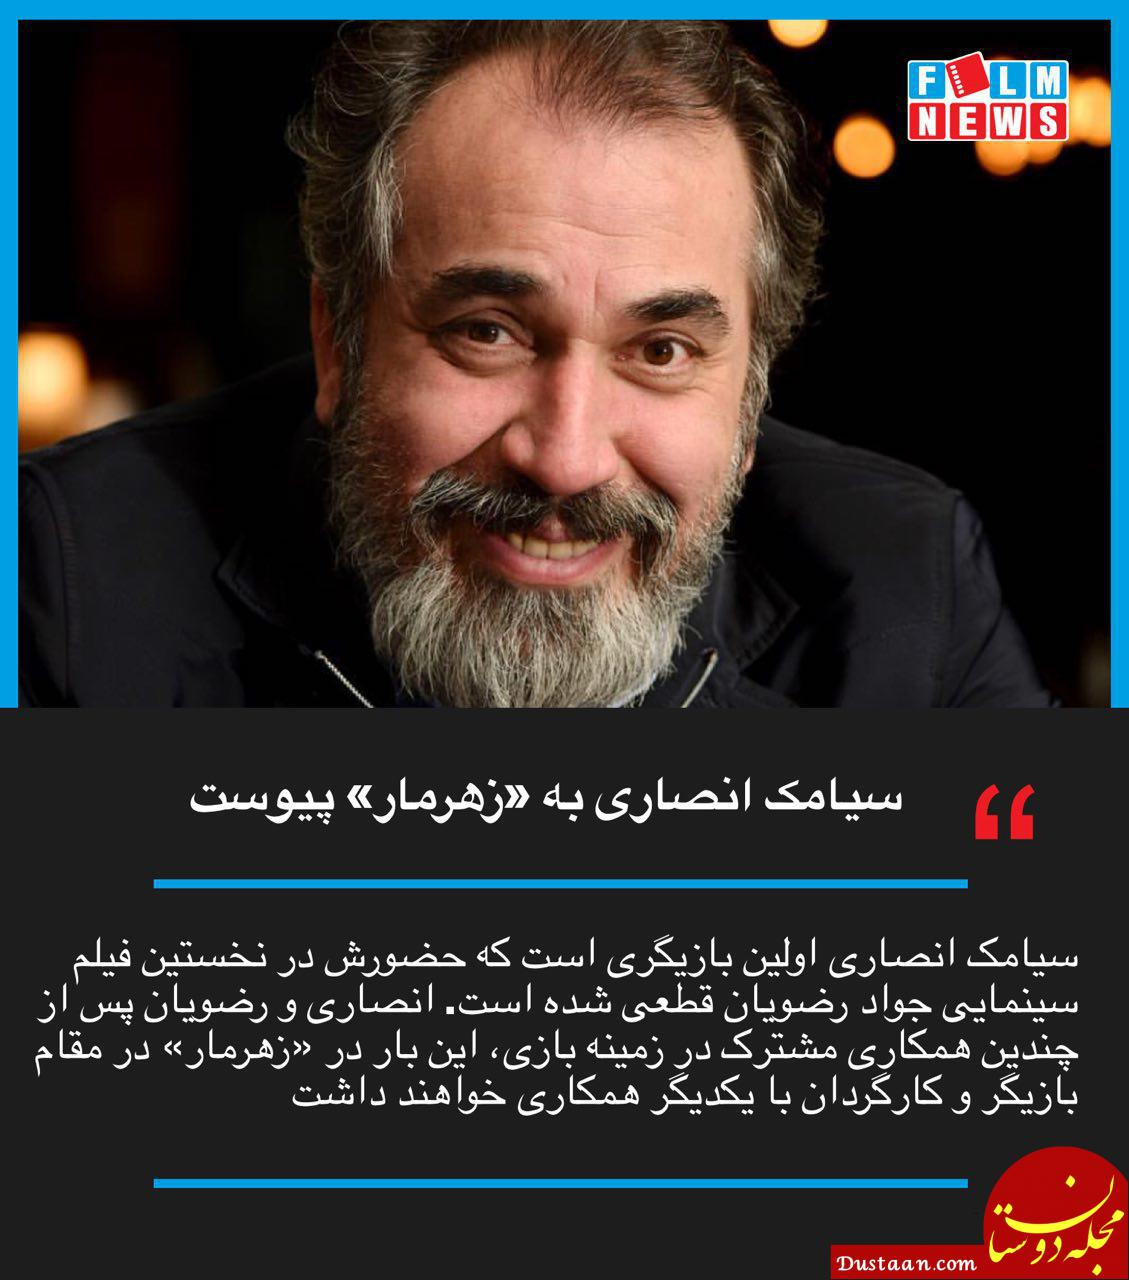 www.dustaan.com سیامک انصاری در «زهرمار» پیوست!